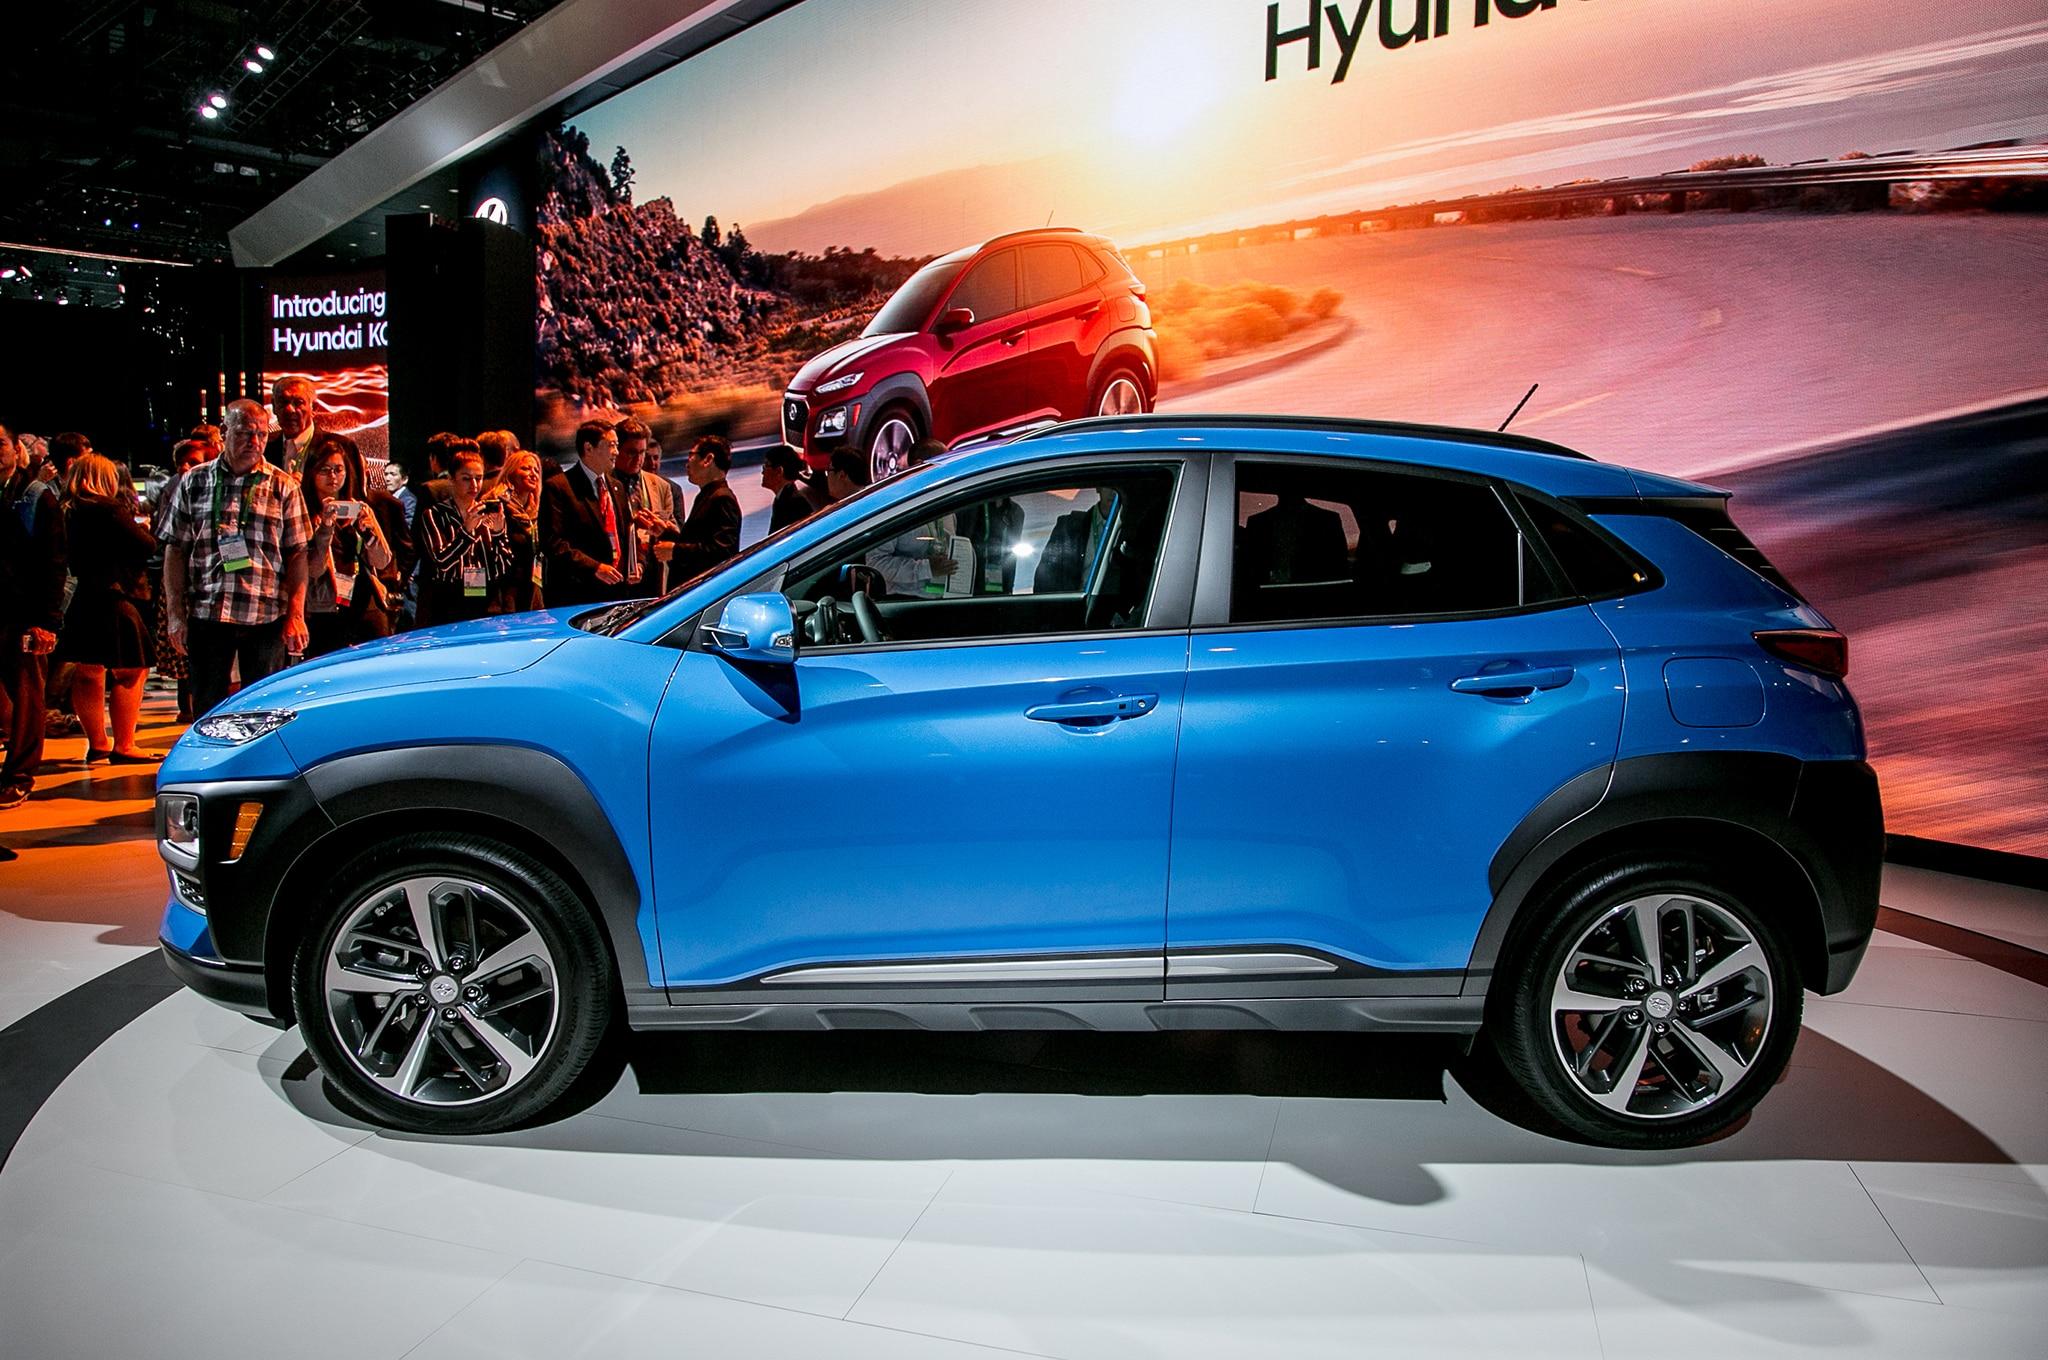 2018 Hyundai Kona Makes U.S. Debut | Automobile Magazine